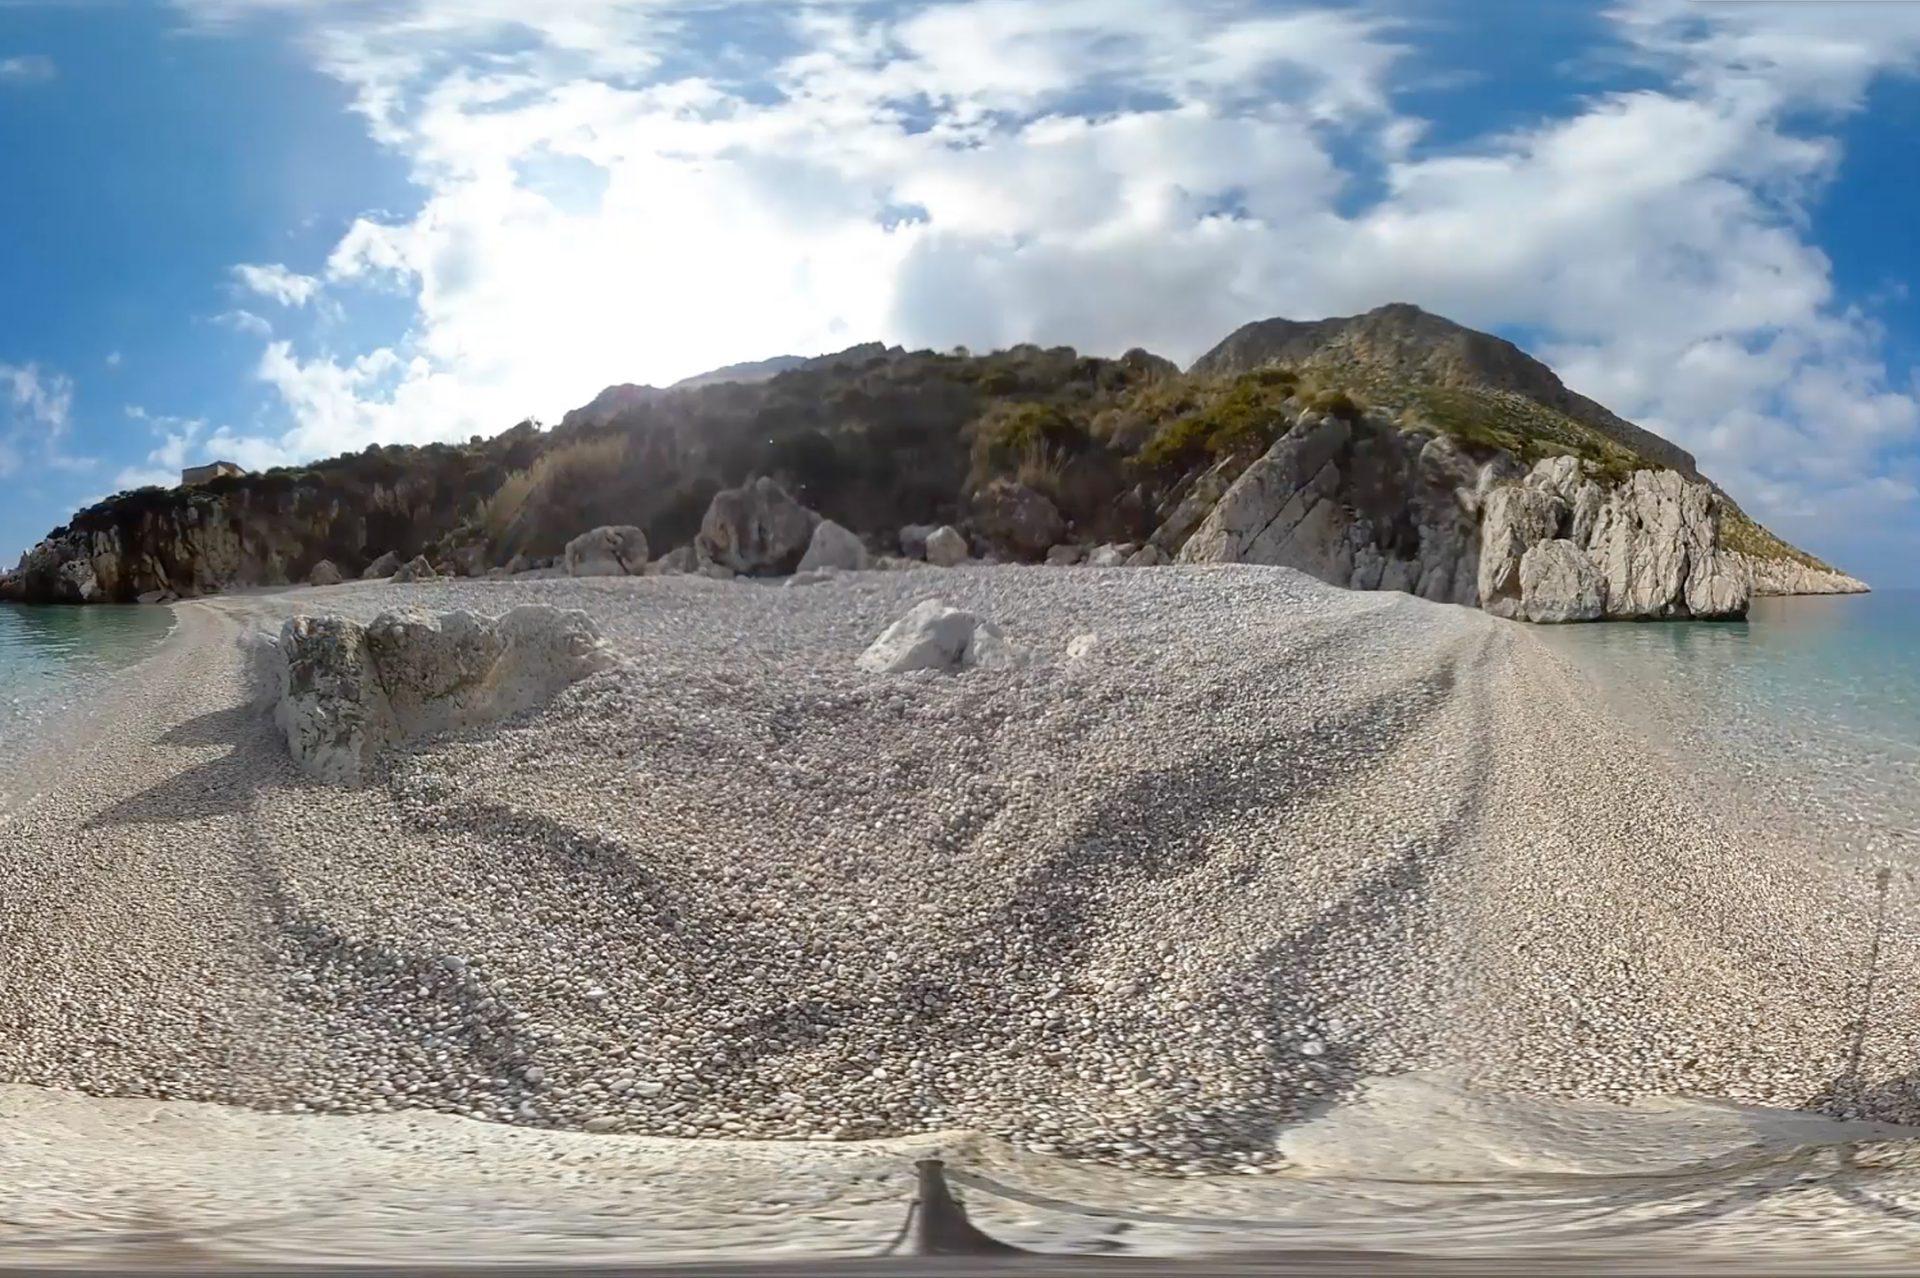 Beach scene from VR trials